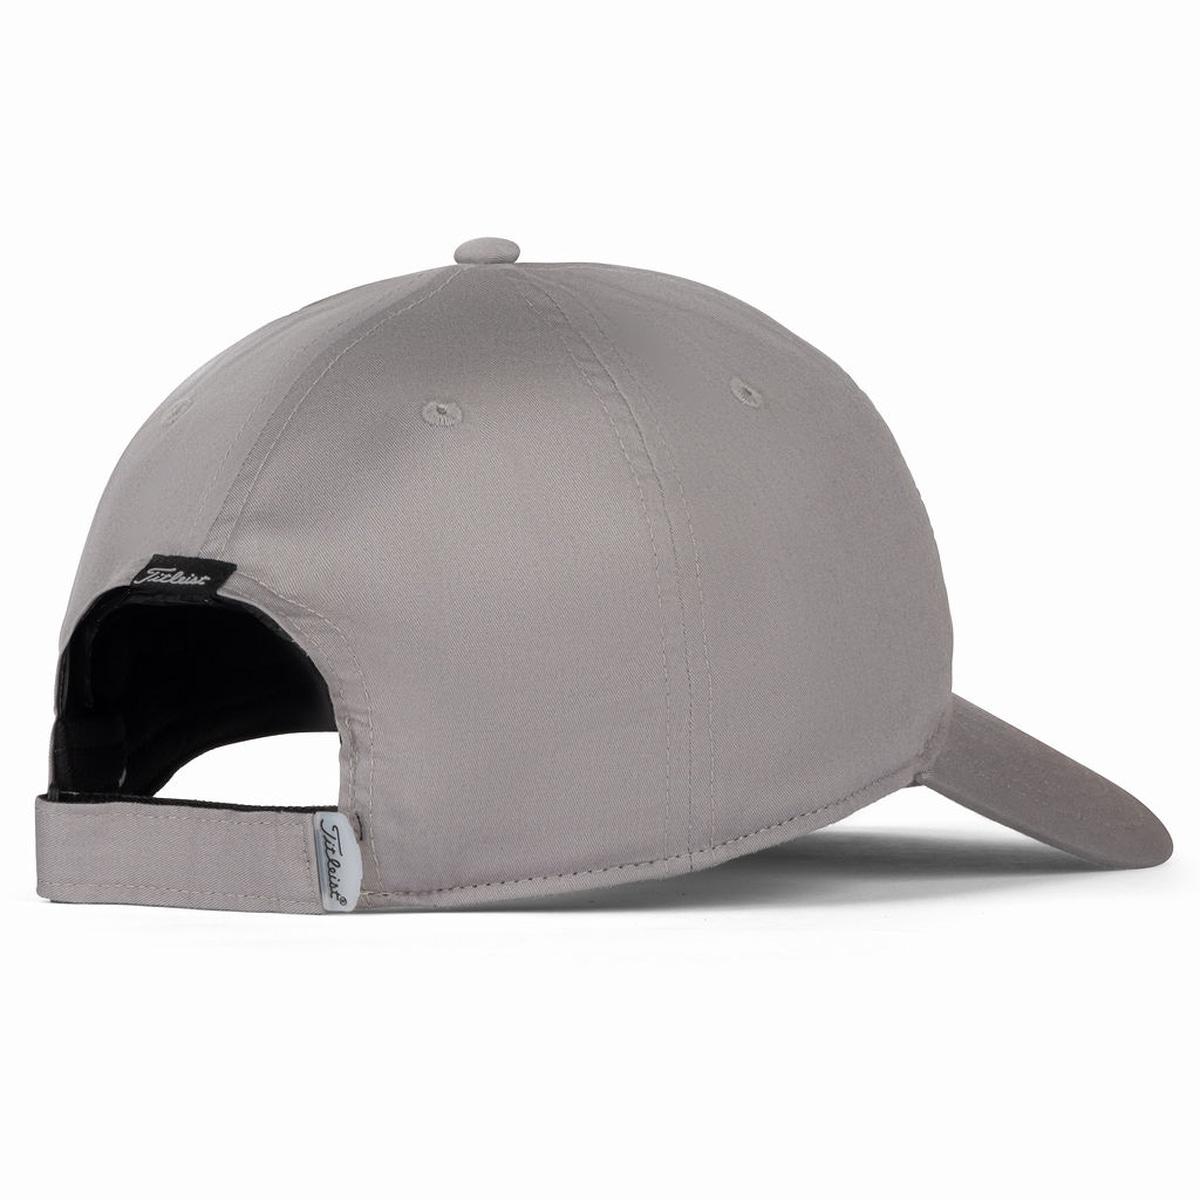 Stars and Stripes Nantucket Lightweight Hat